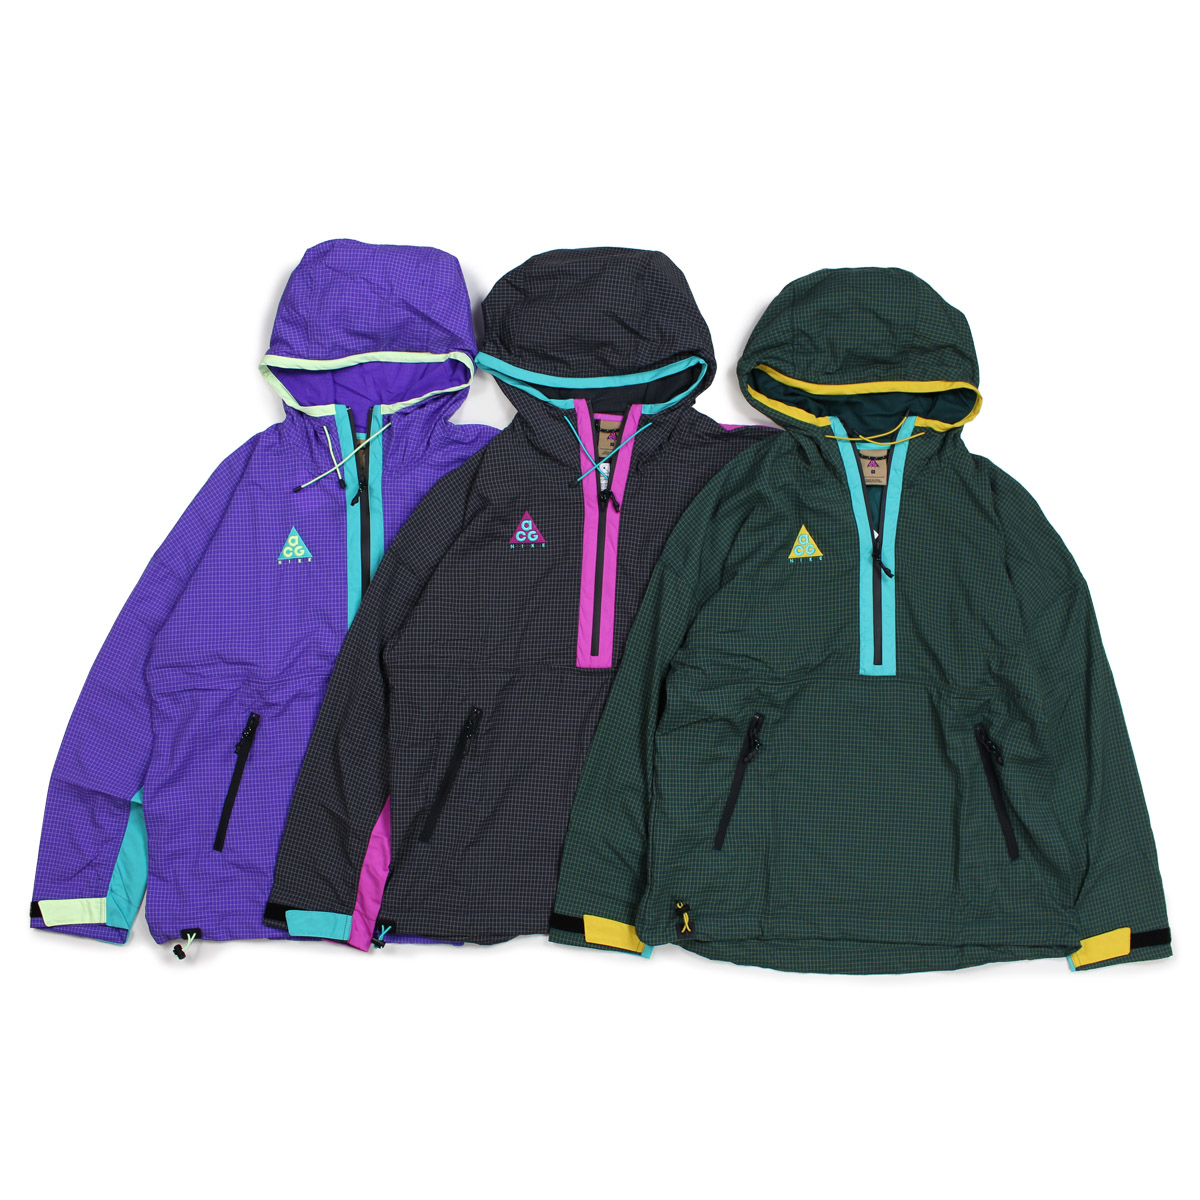 Nike NIKE Woo jacket men nylon jacket ACG WOVEN HOOD ANORAK JACKET 931907 [189]